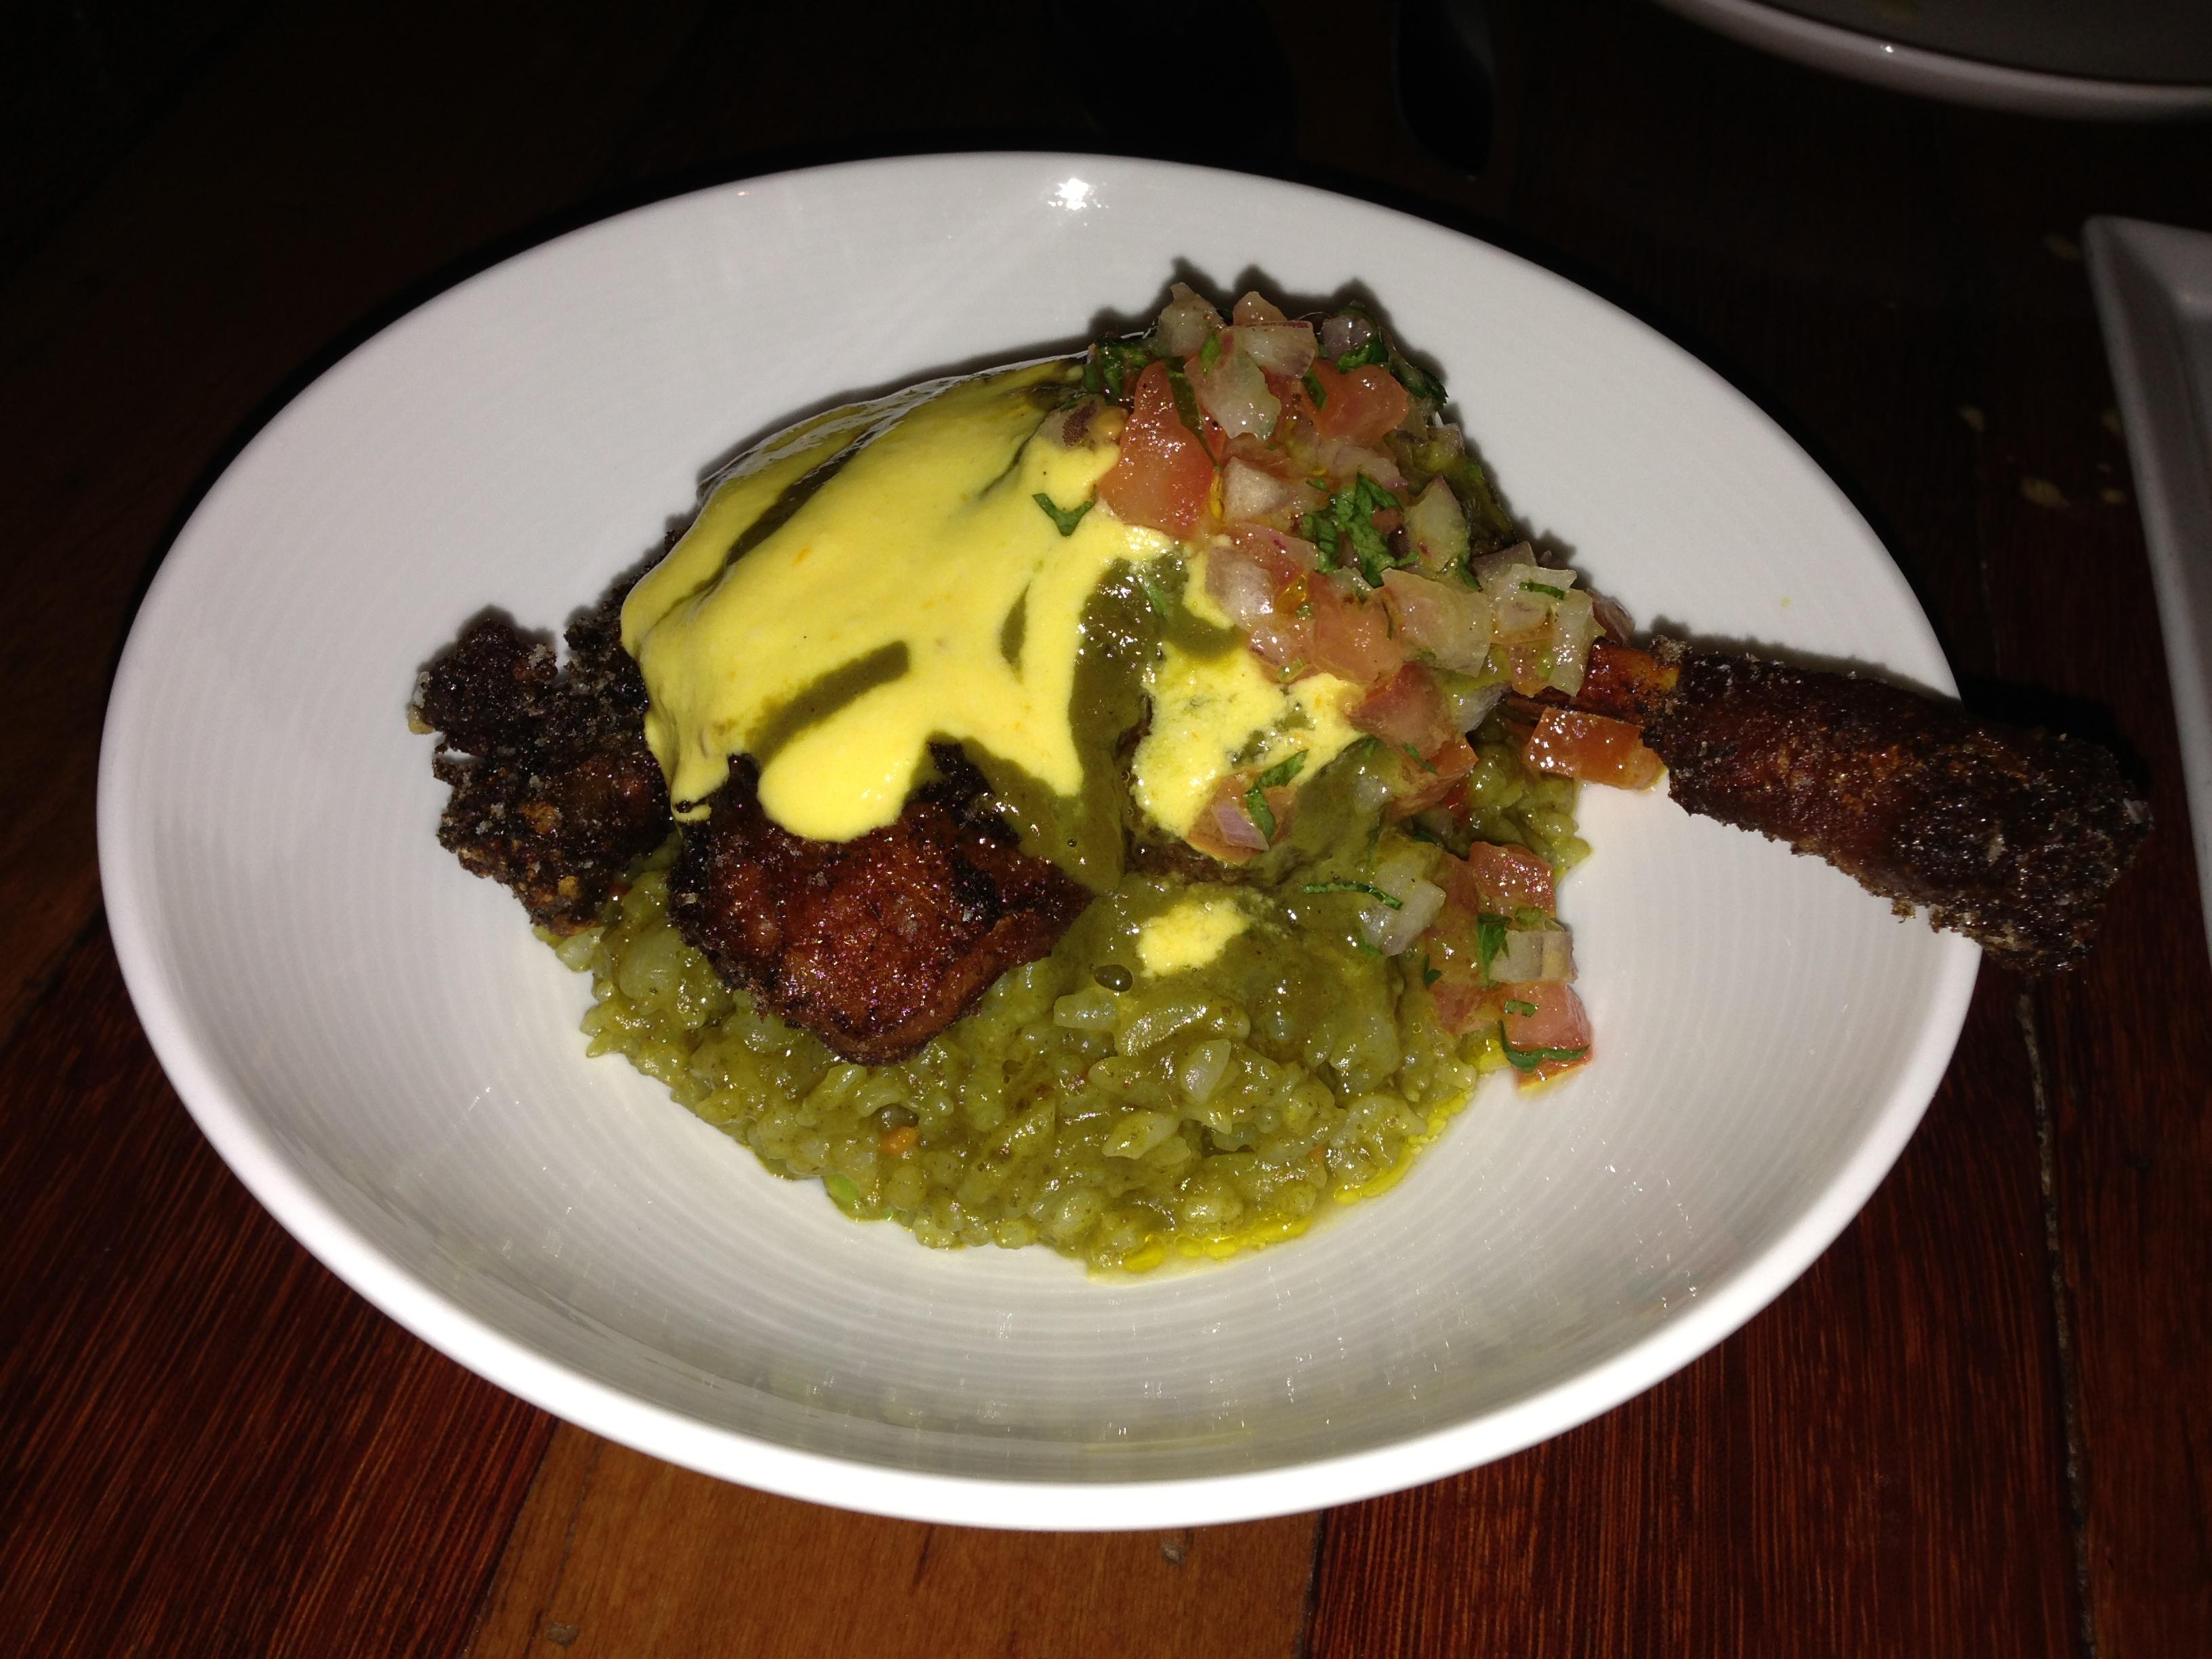 ... Braised Duck Leg, Peruvian Beer Sauce, Cilantro Rice, Tomato Relish